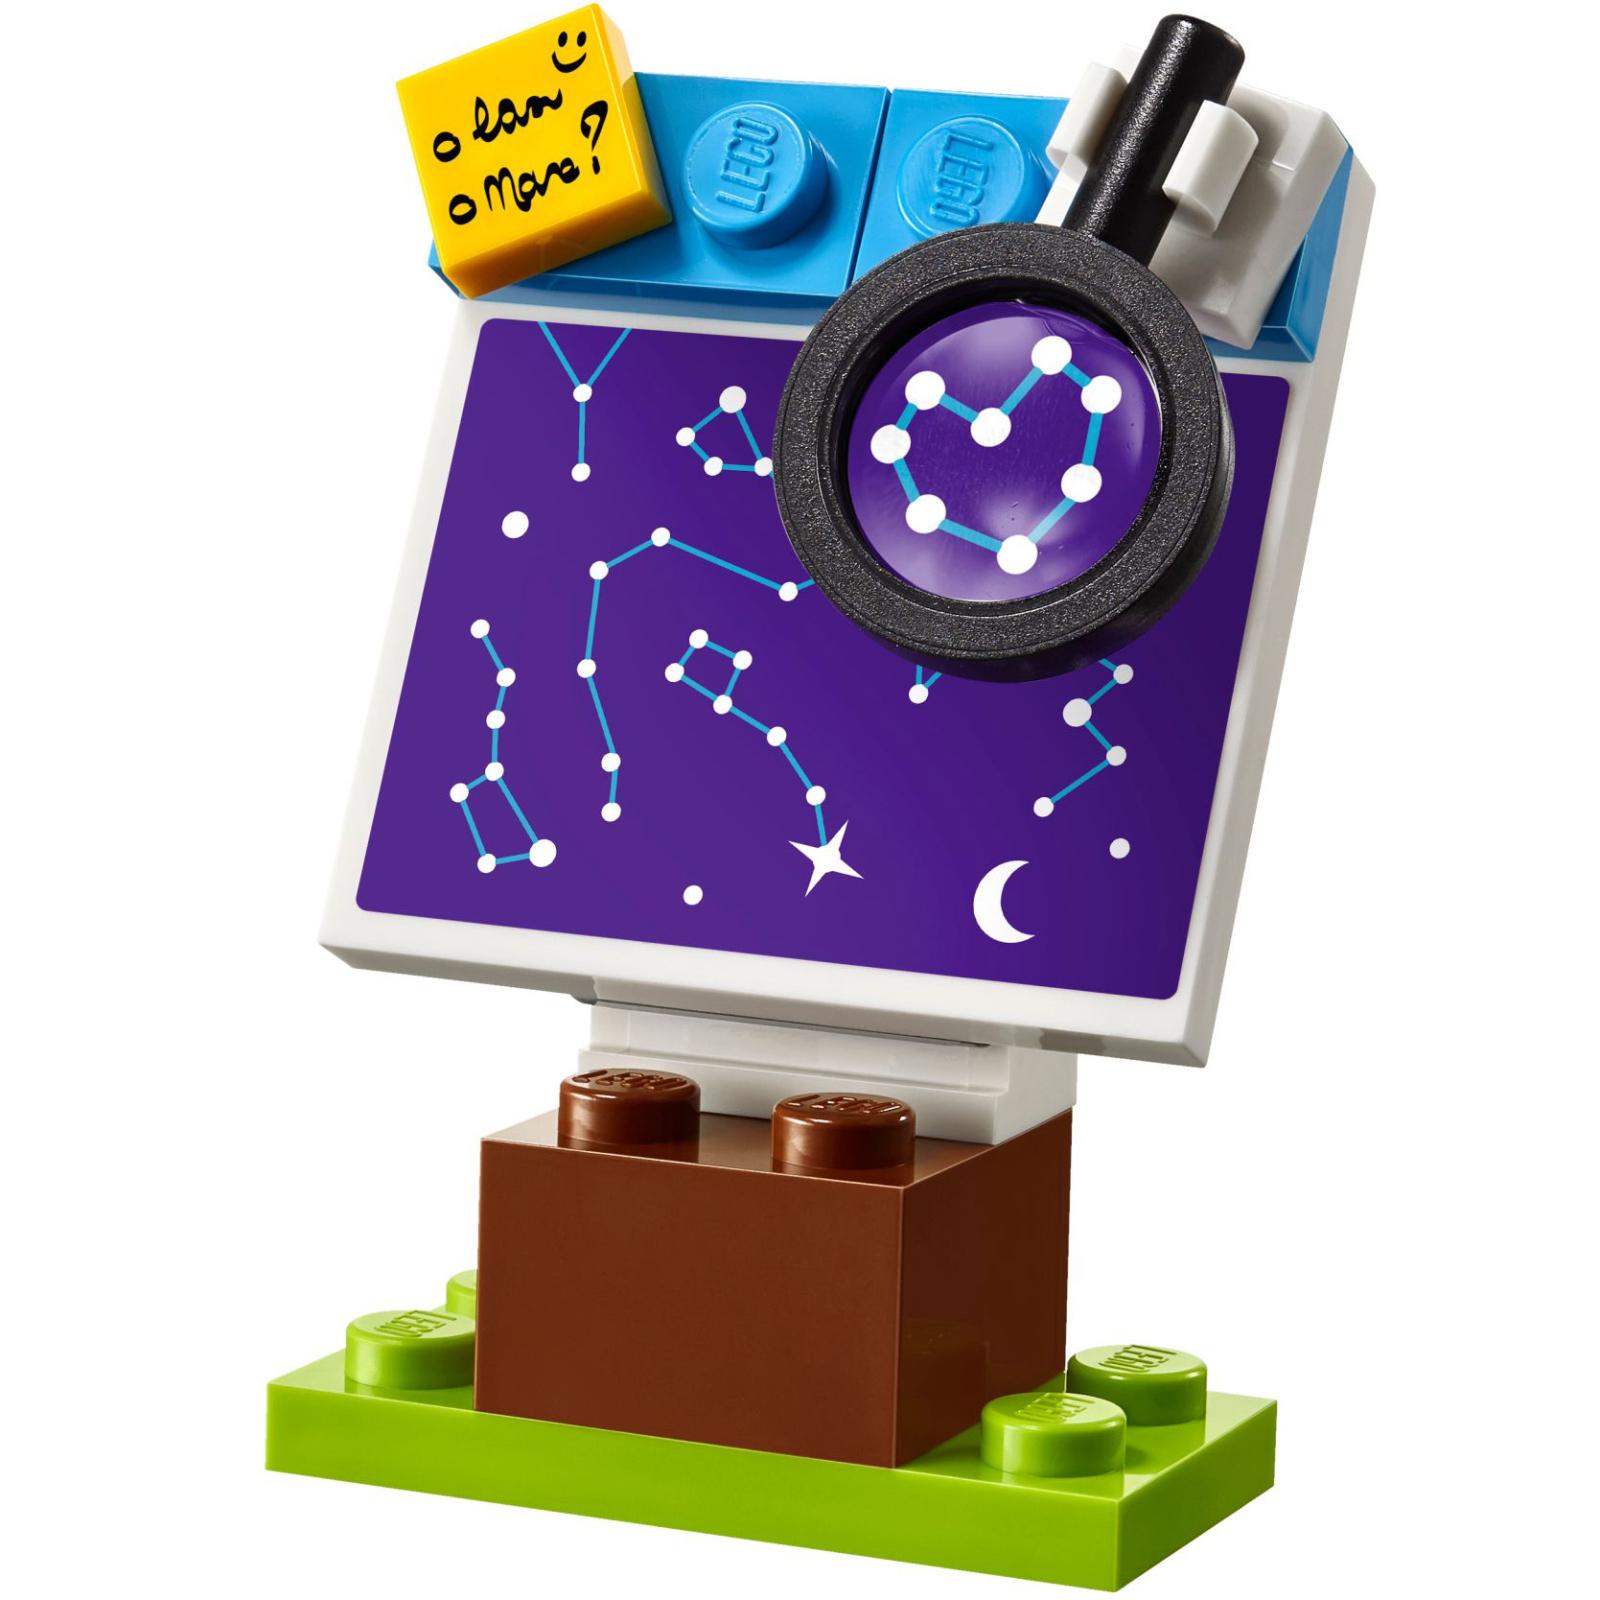 Конструктор LEGO Friends Звездное небо Оливии (41116) изображение 7